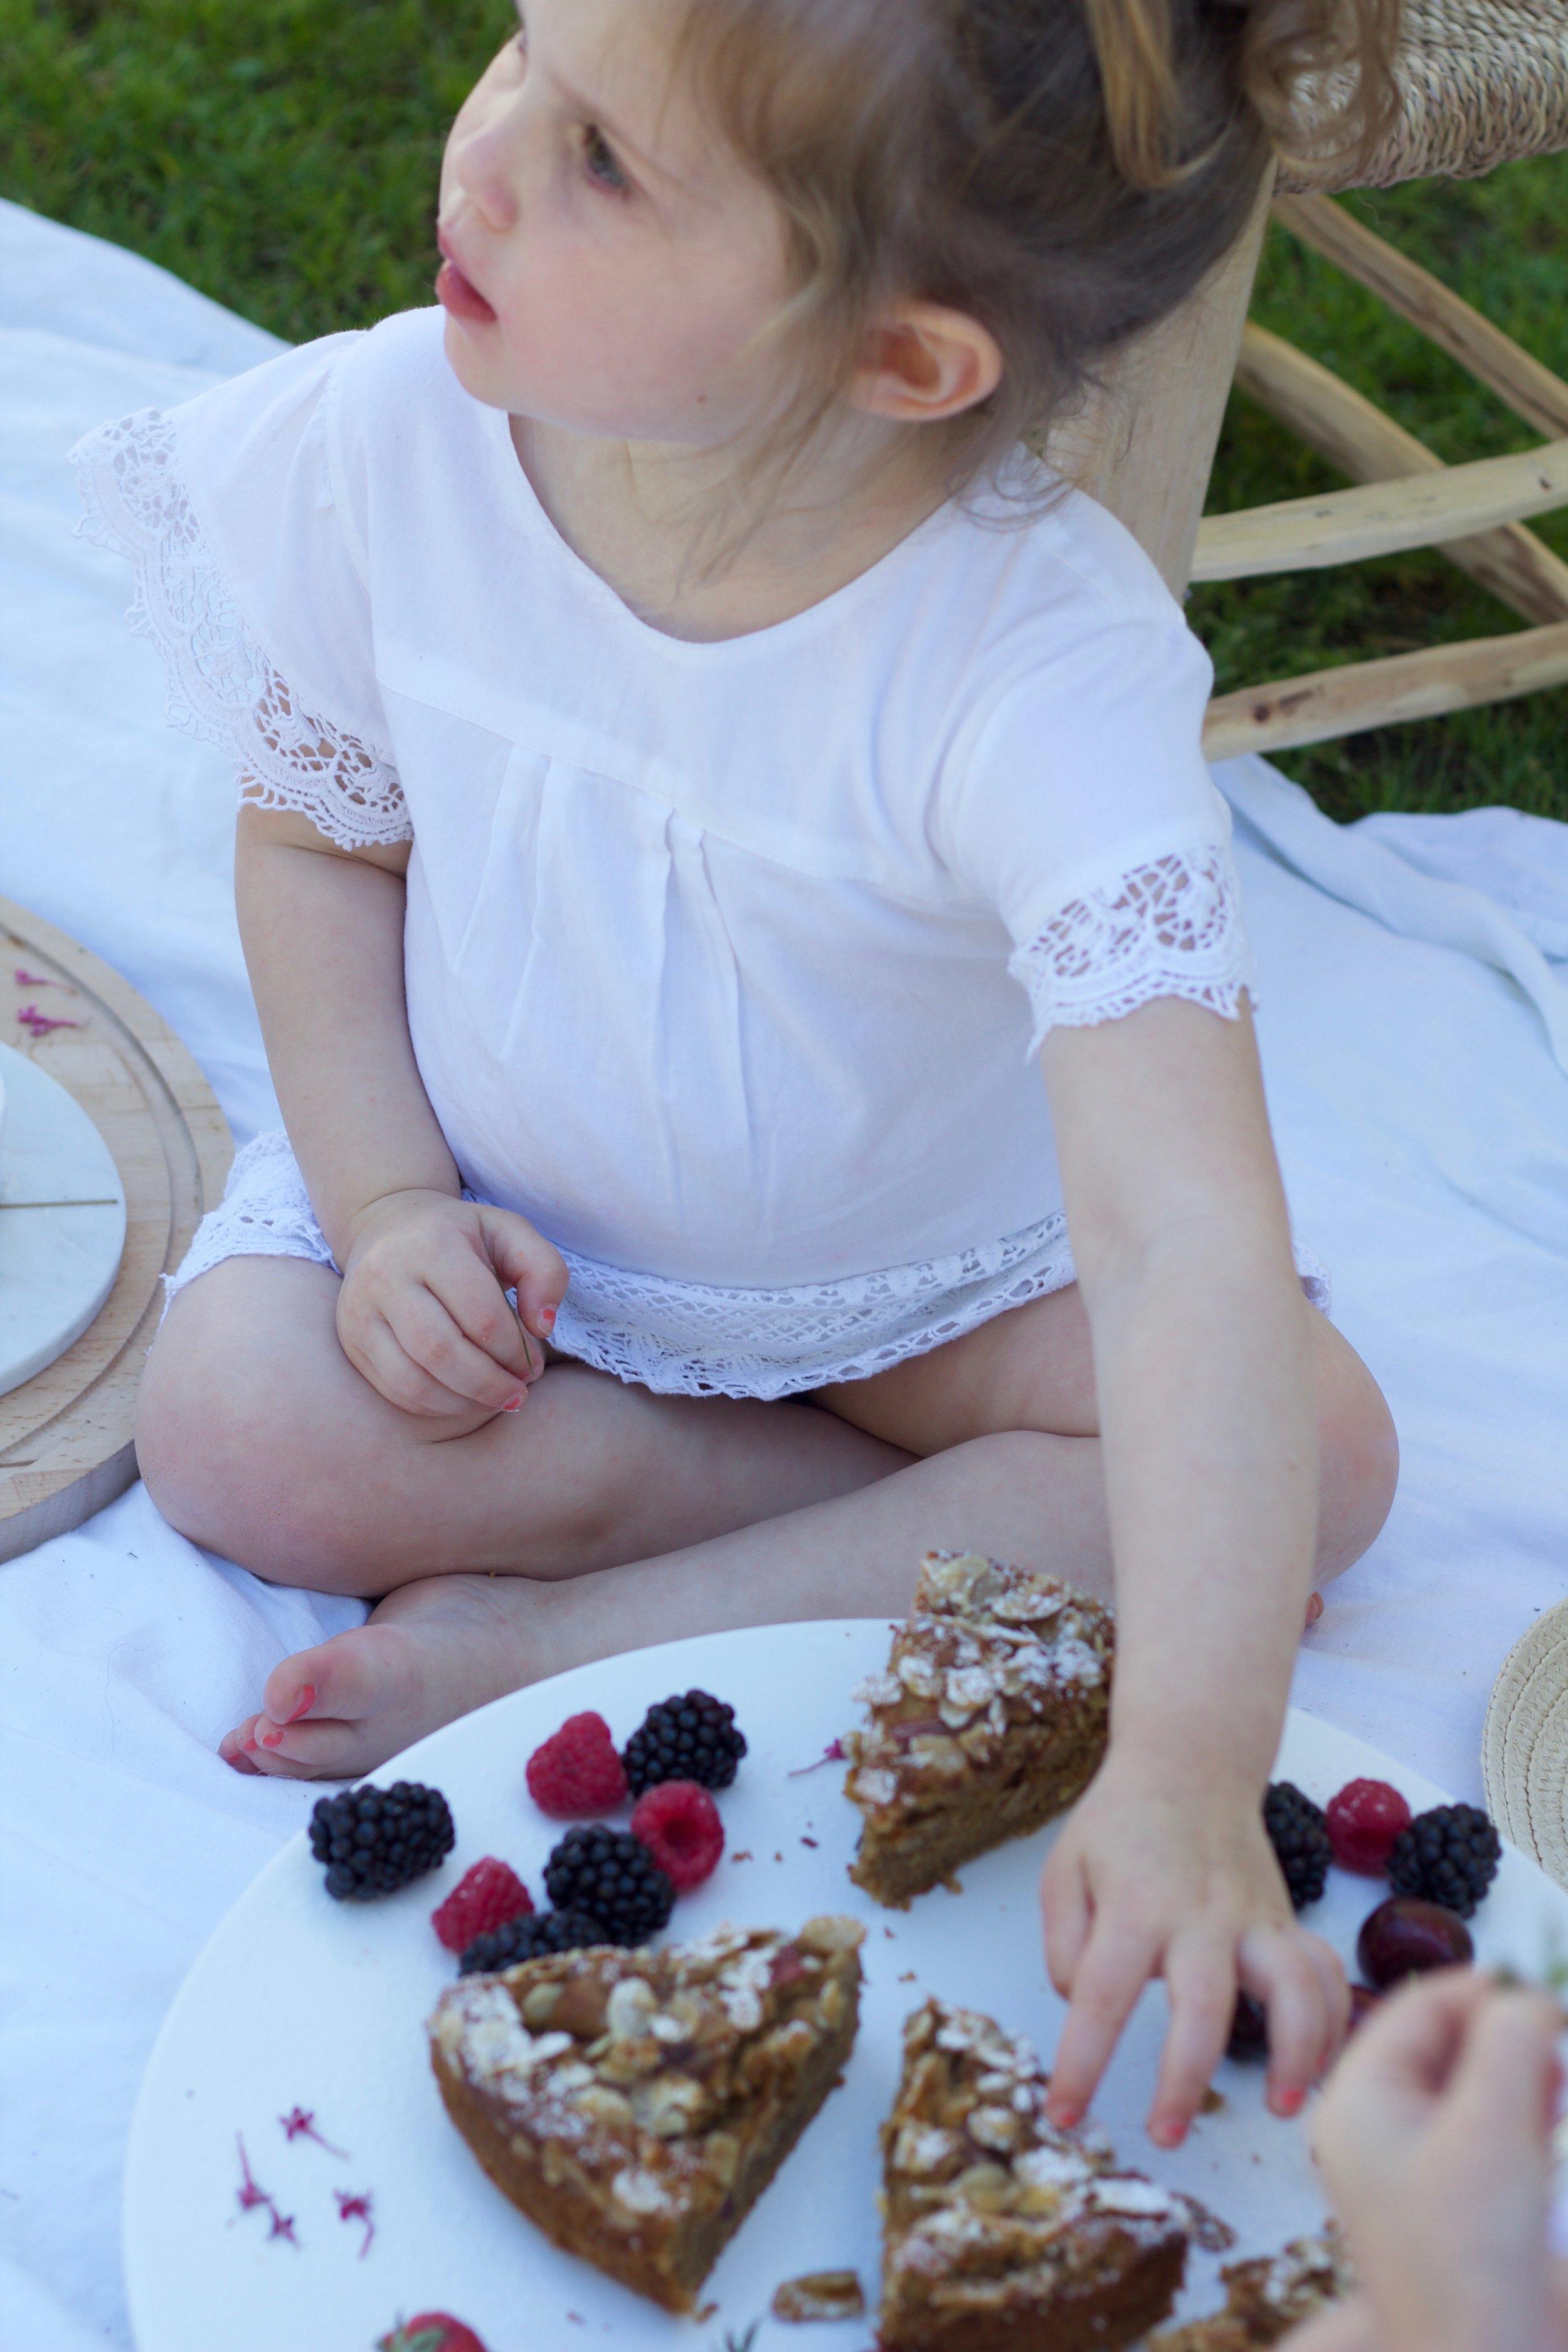 family picinics-motherkind blog